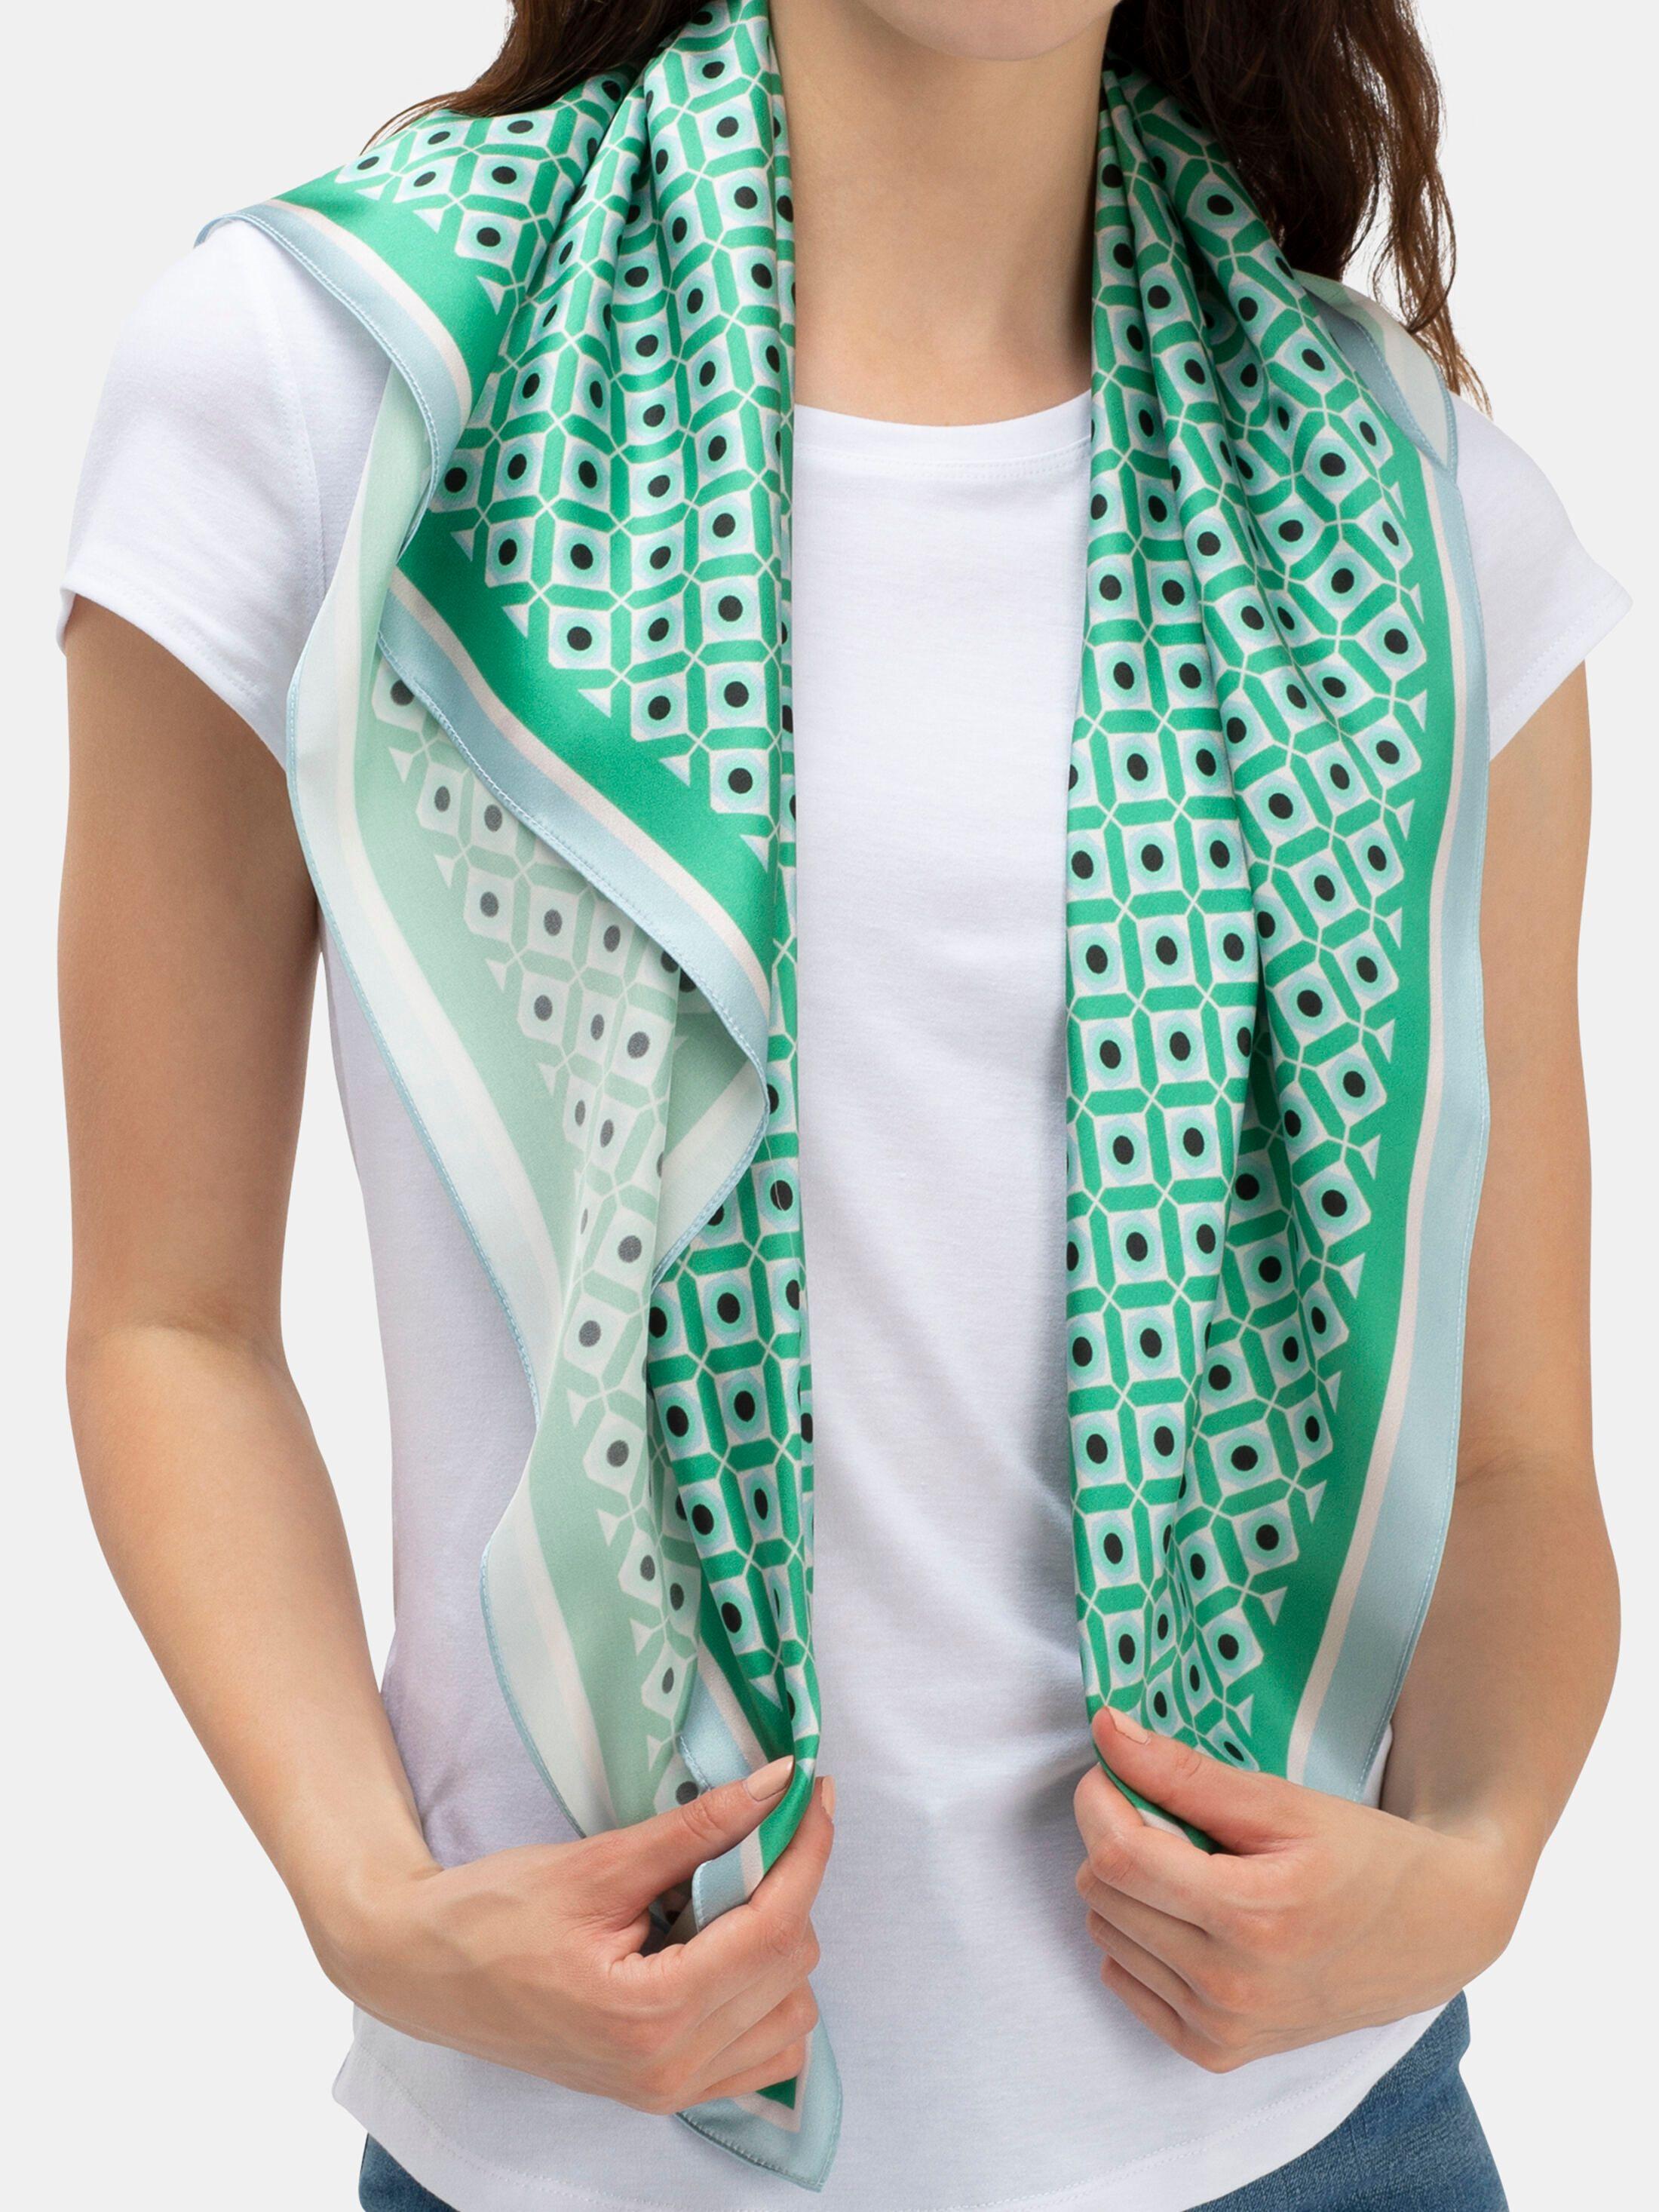 printed bandanas